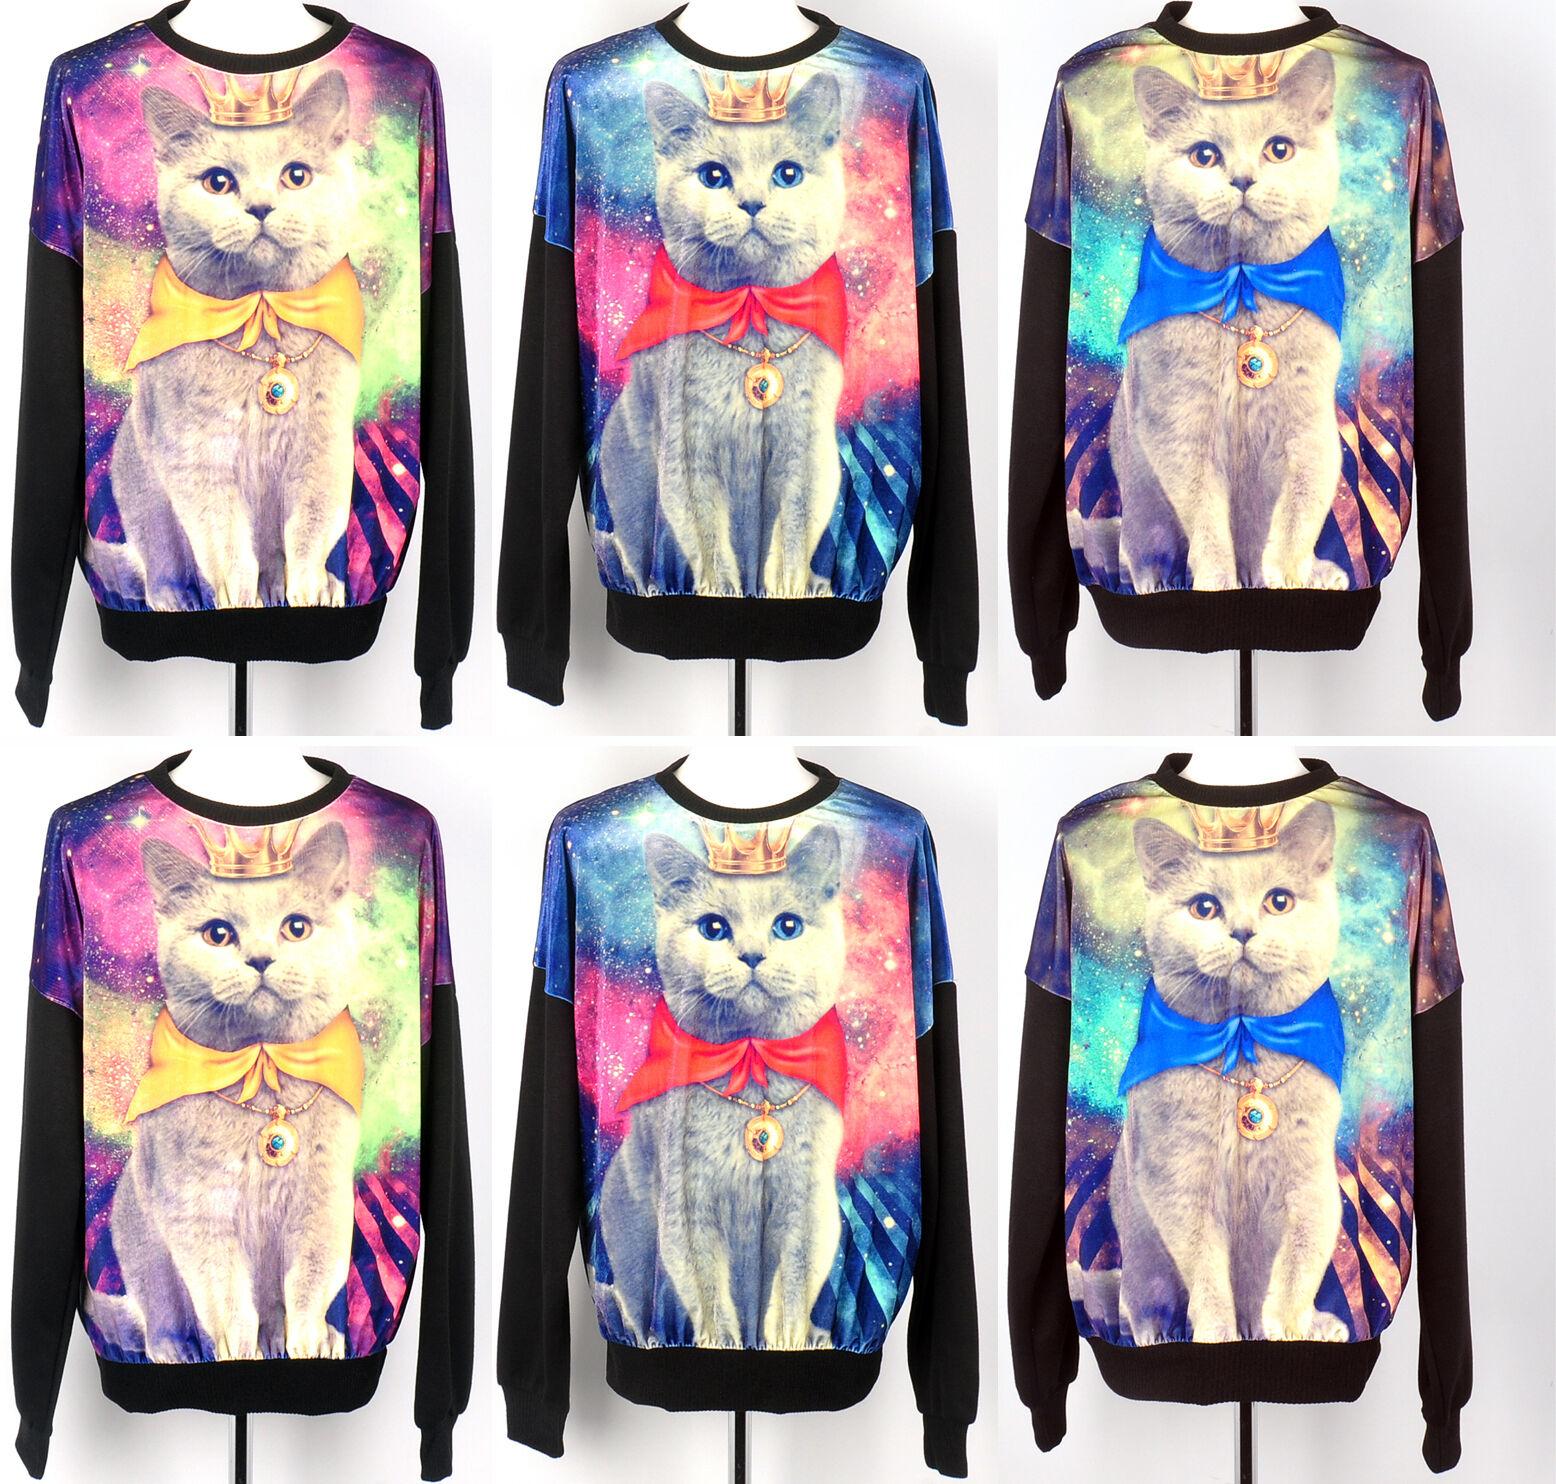 womens Galaxy cat t shirts loose stellar velvet graphic shirt long sleeve red